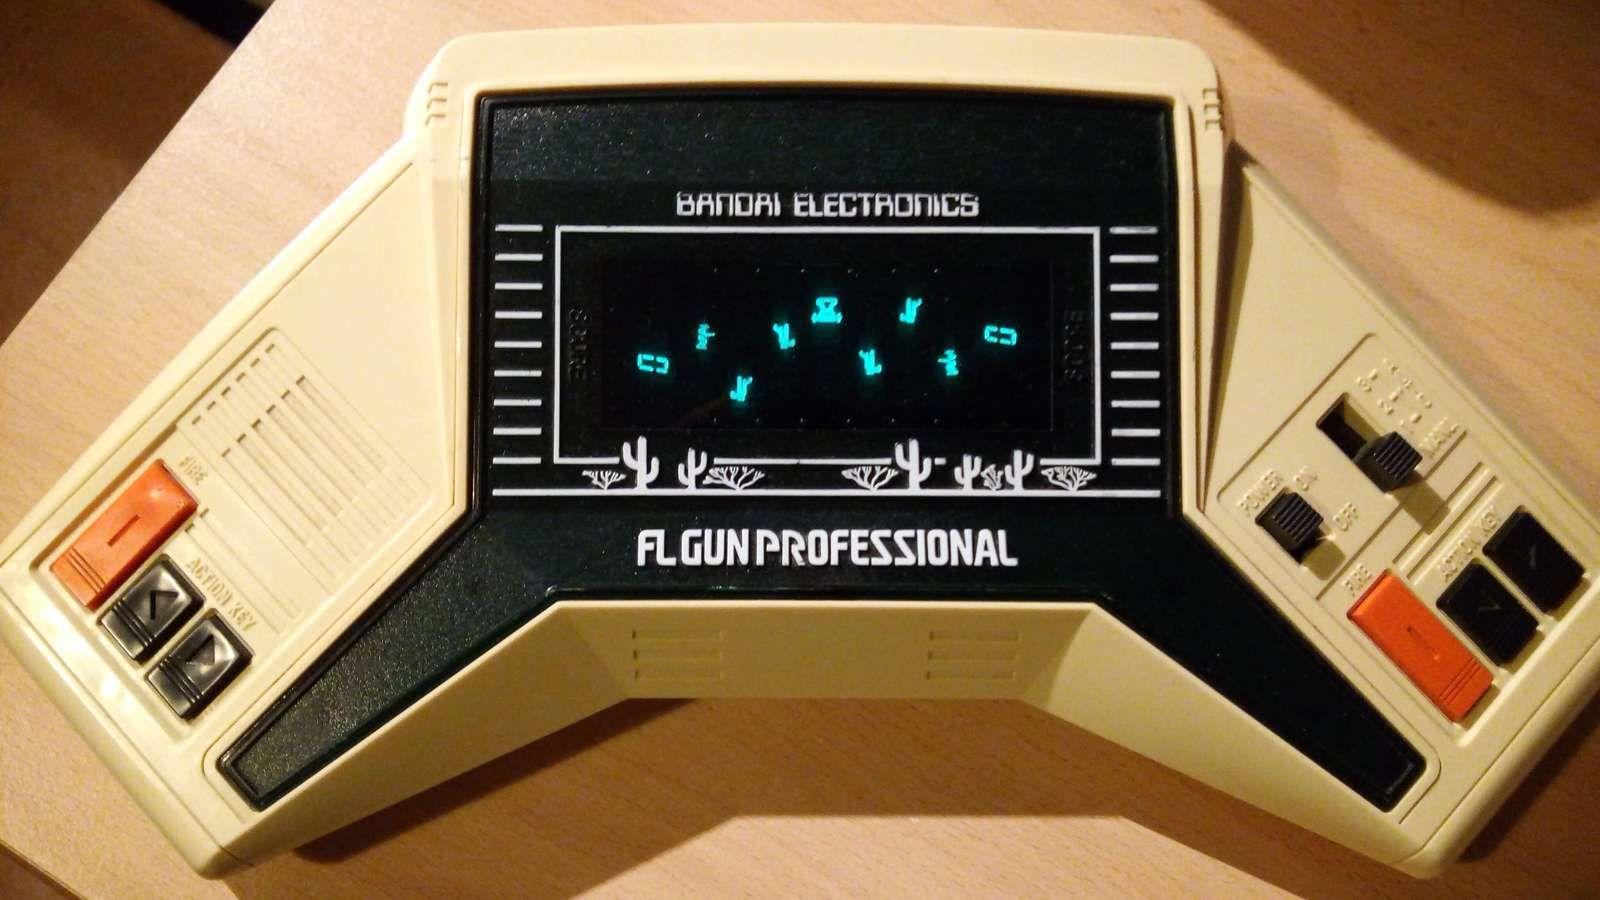 FL GUN PROFESSIONAL (DUEL) - BANDAI ELECTRONICS